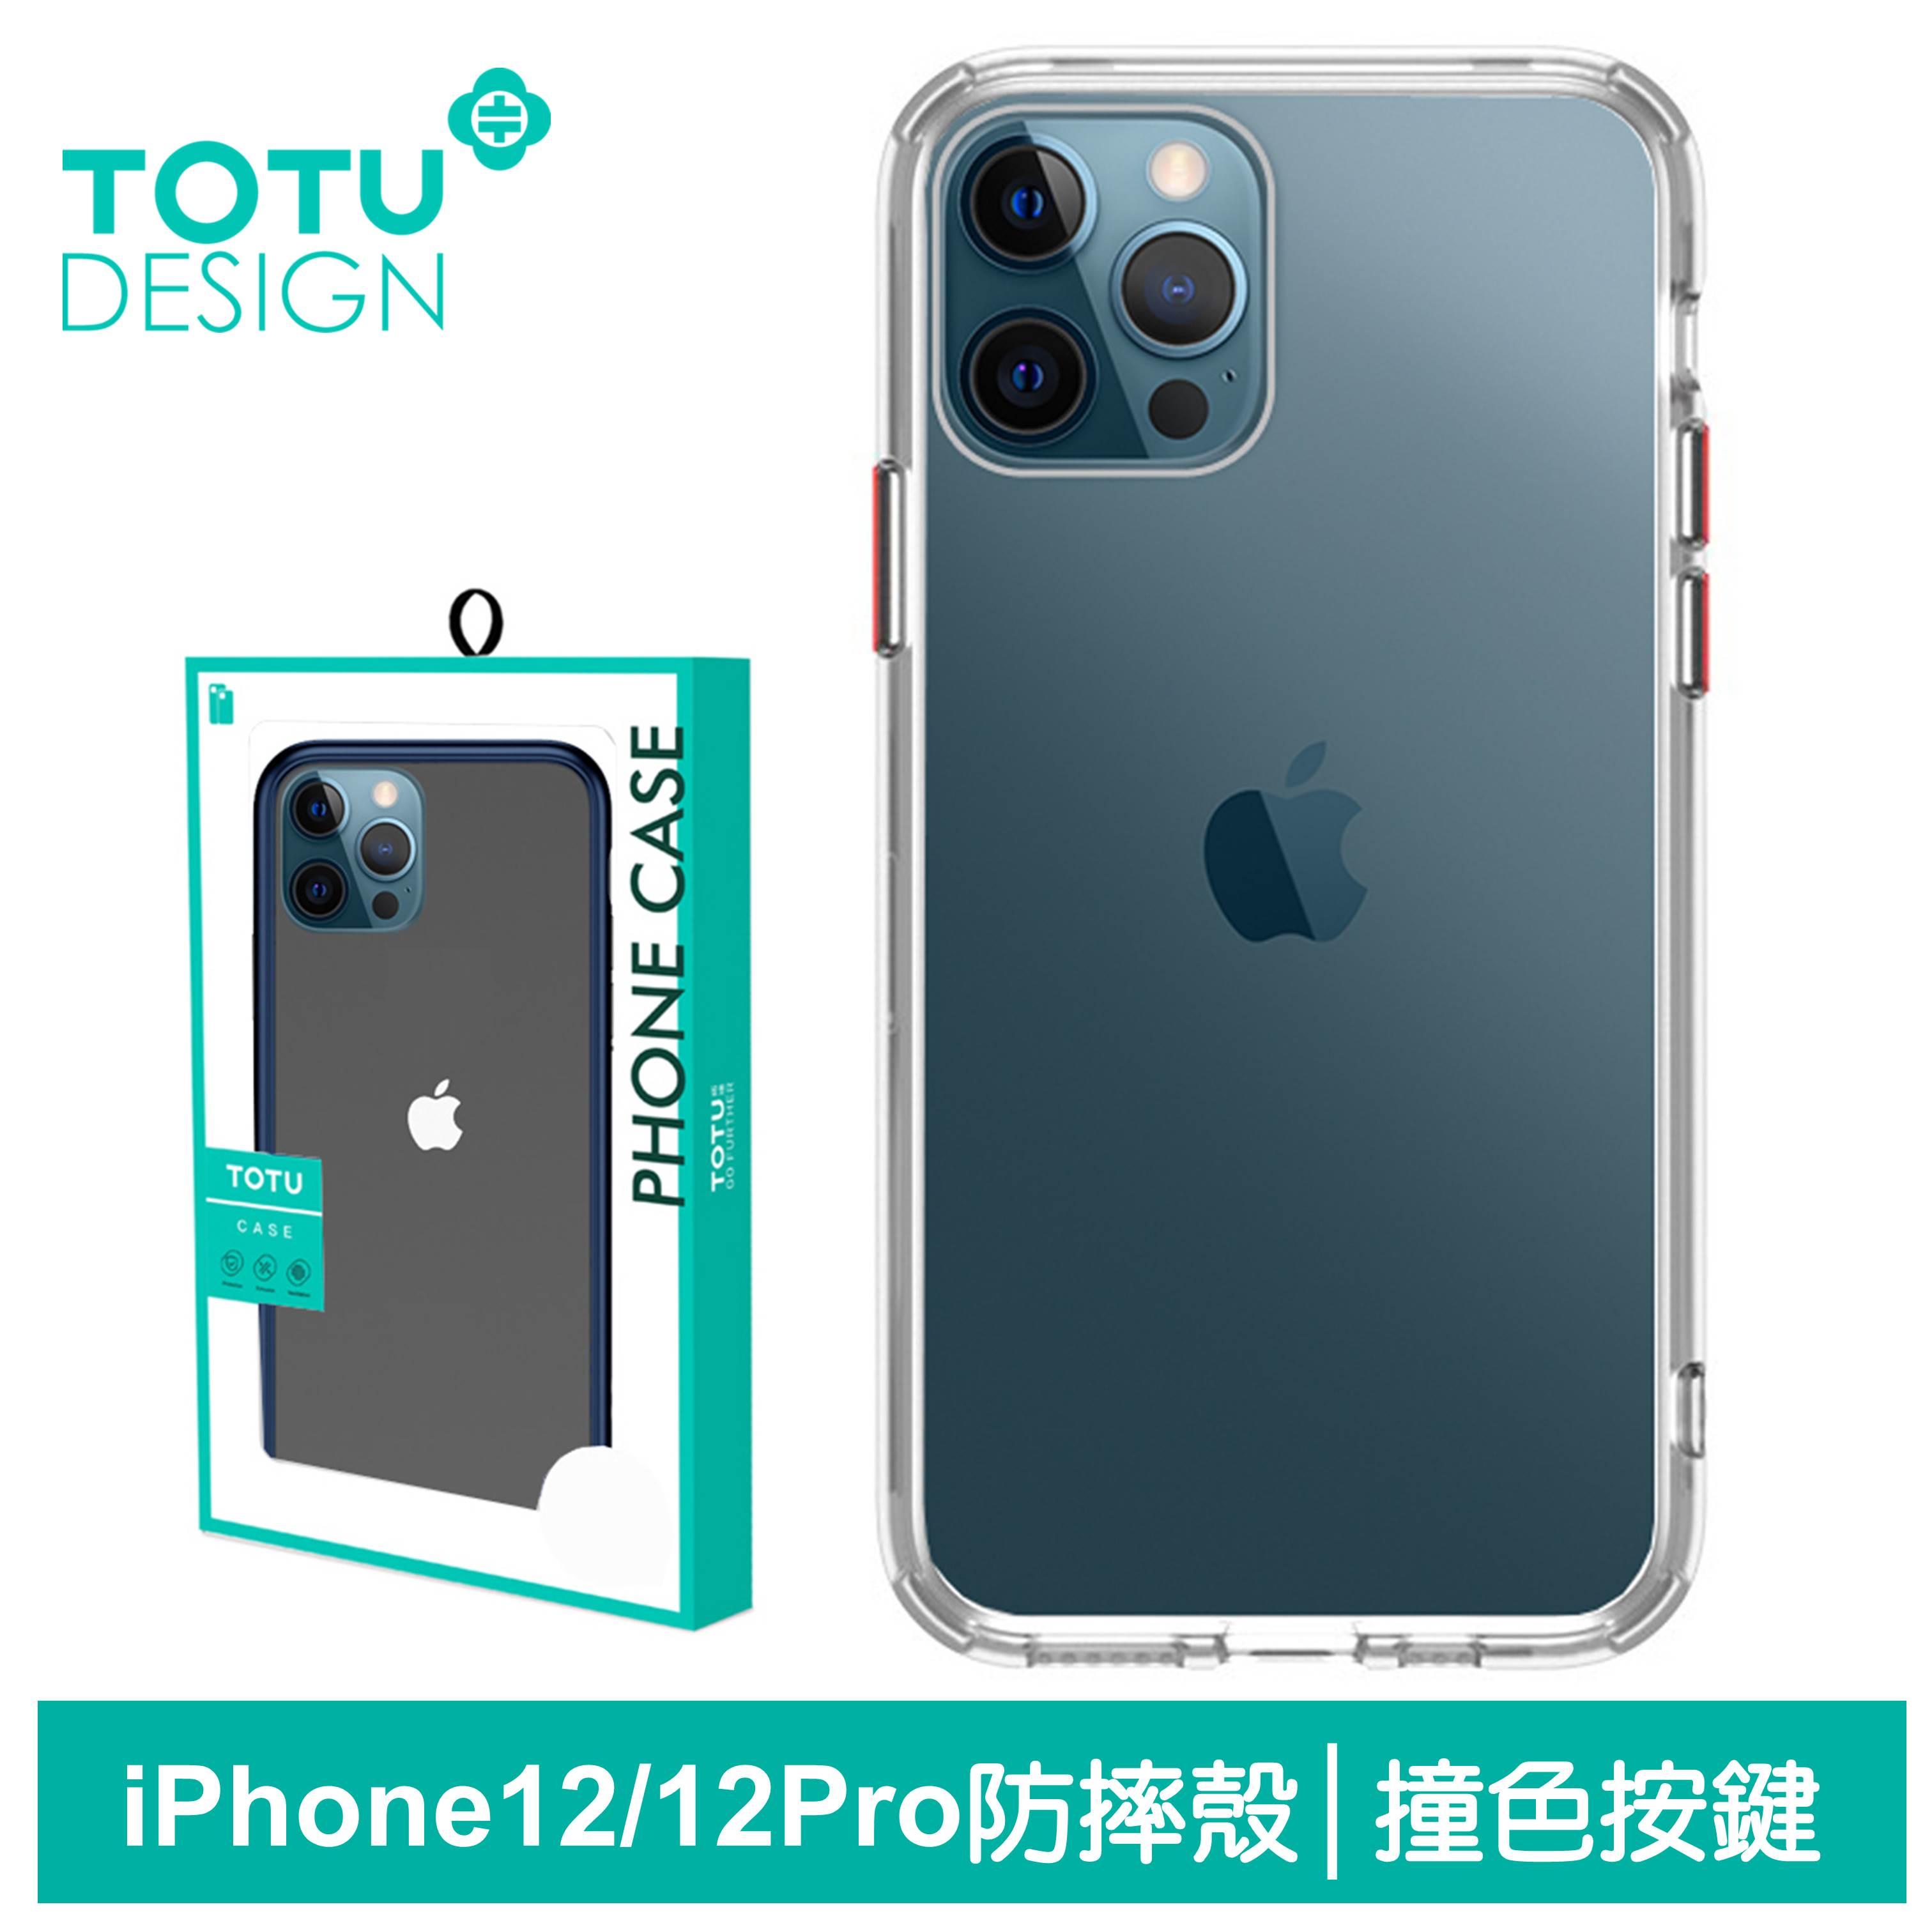 TOTU台灣官方 iPhone 12 / 12 Pro 手機殼 i12 Pro 保護殼 6.1吋 防摔殼 撞色按鍵 晶剛系列 透明